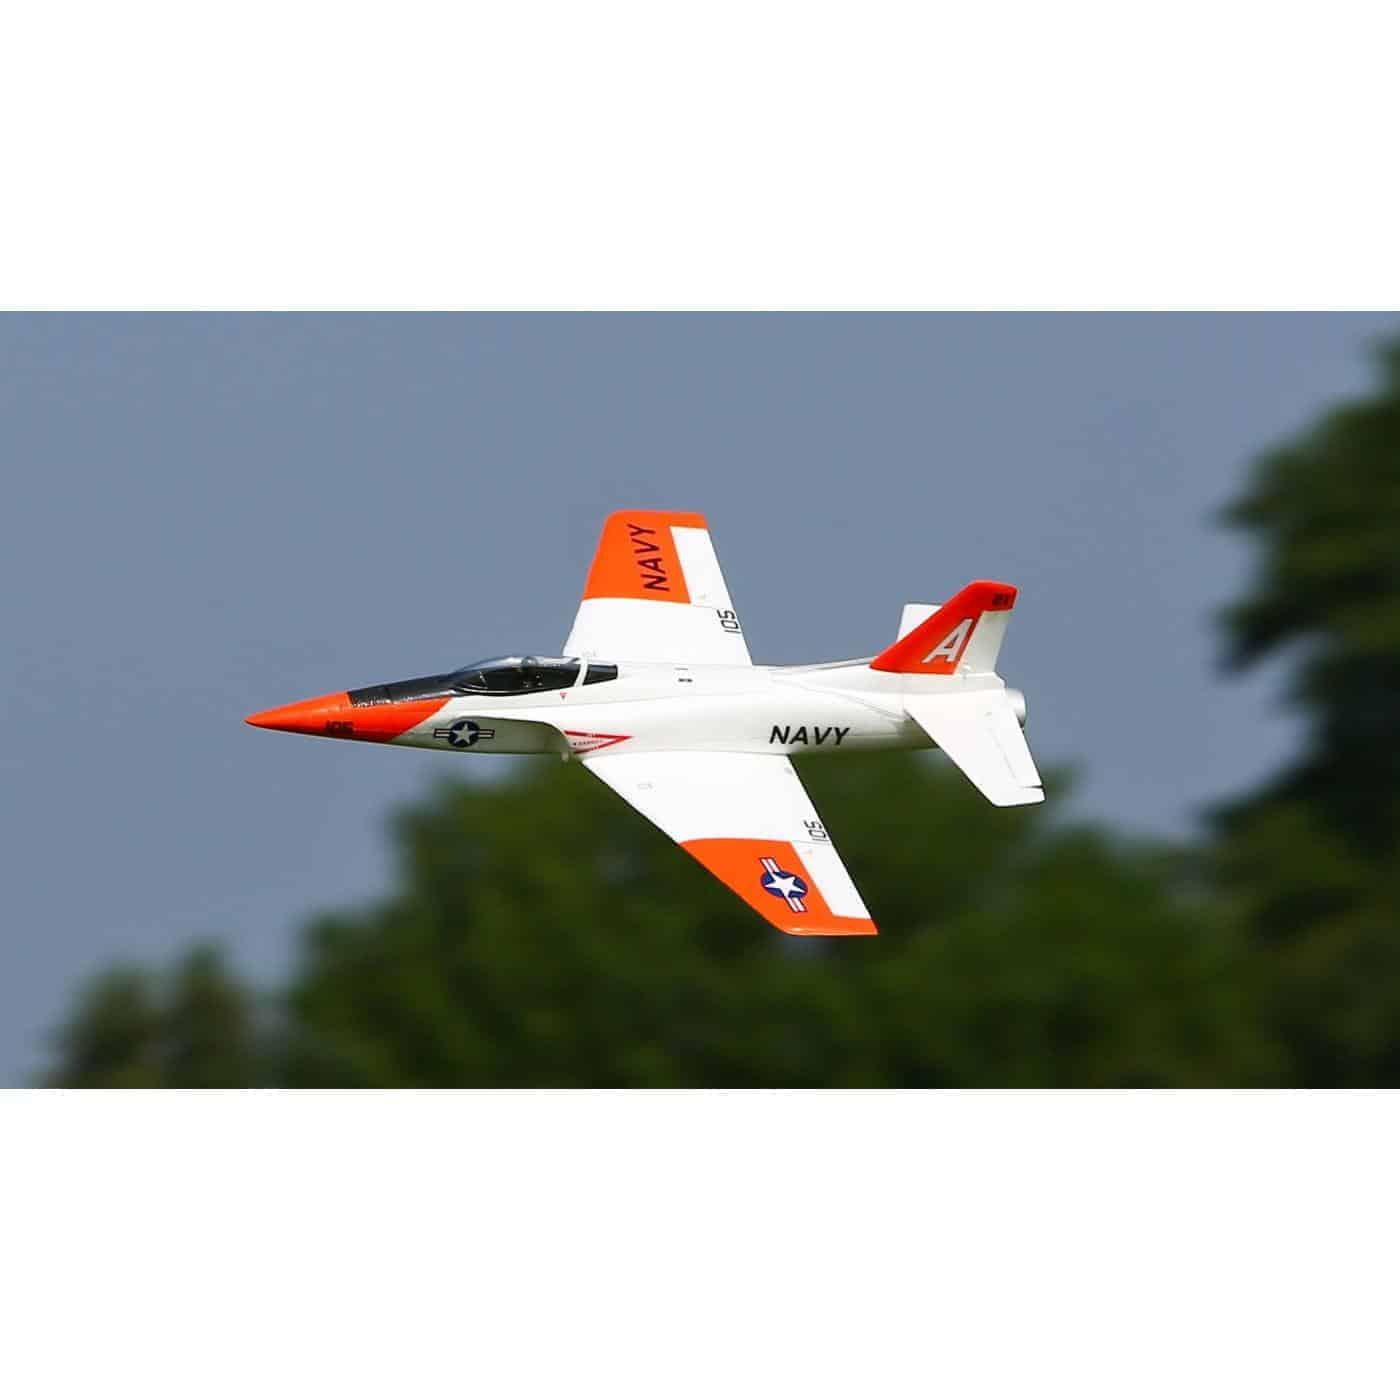 E-Flite UMX™ Habu S 180 DF BNF with SAFE® Technology